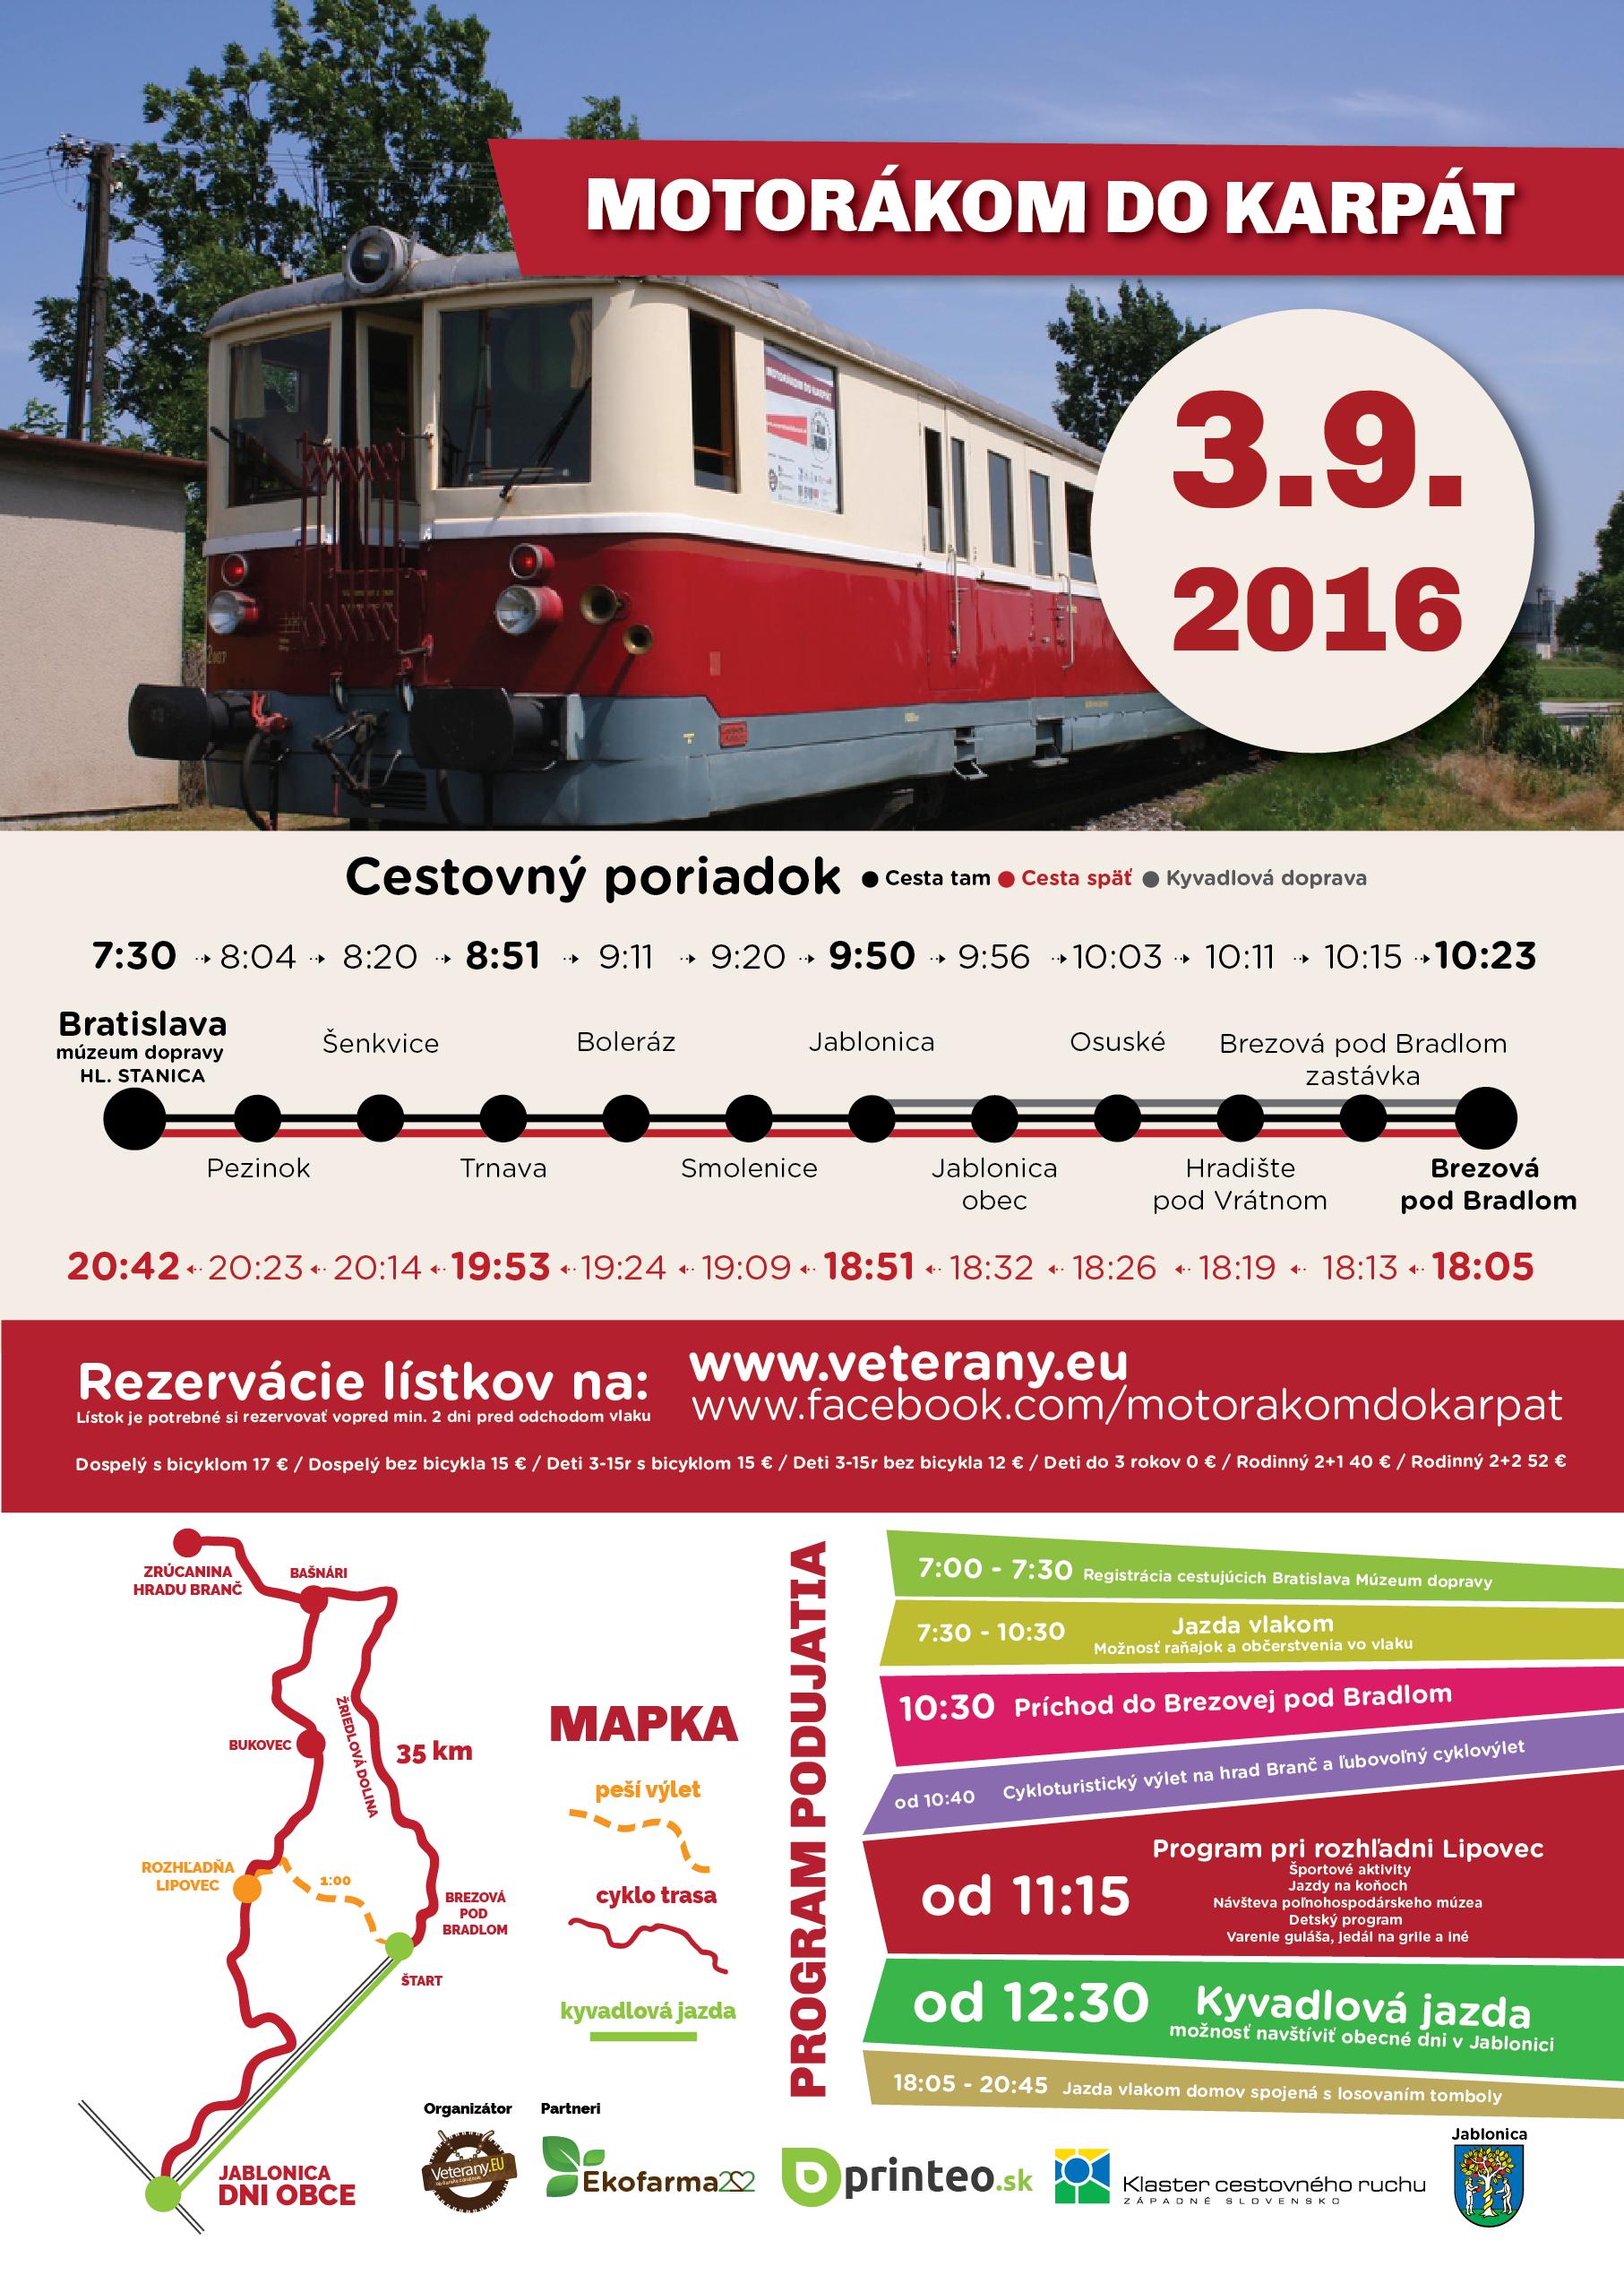 Motorakom do Karpat 3.9.2016